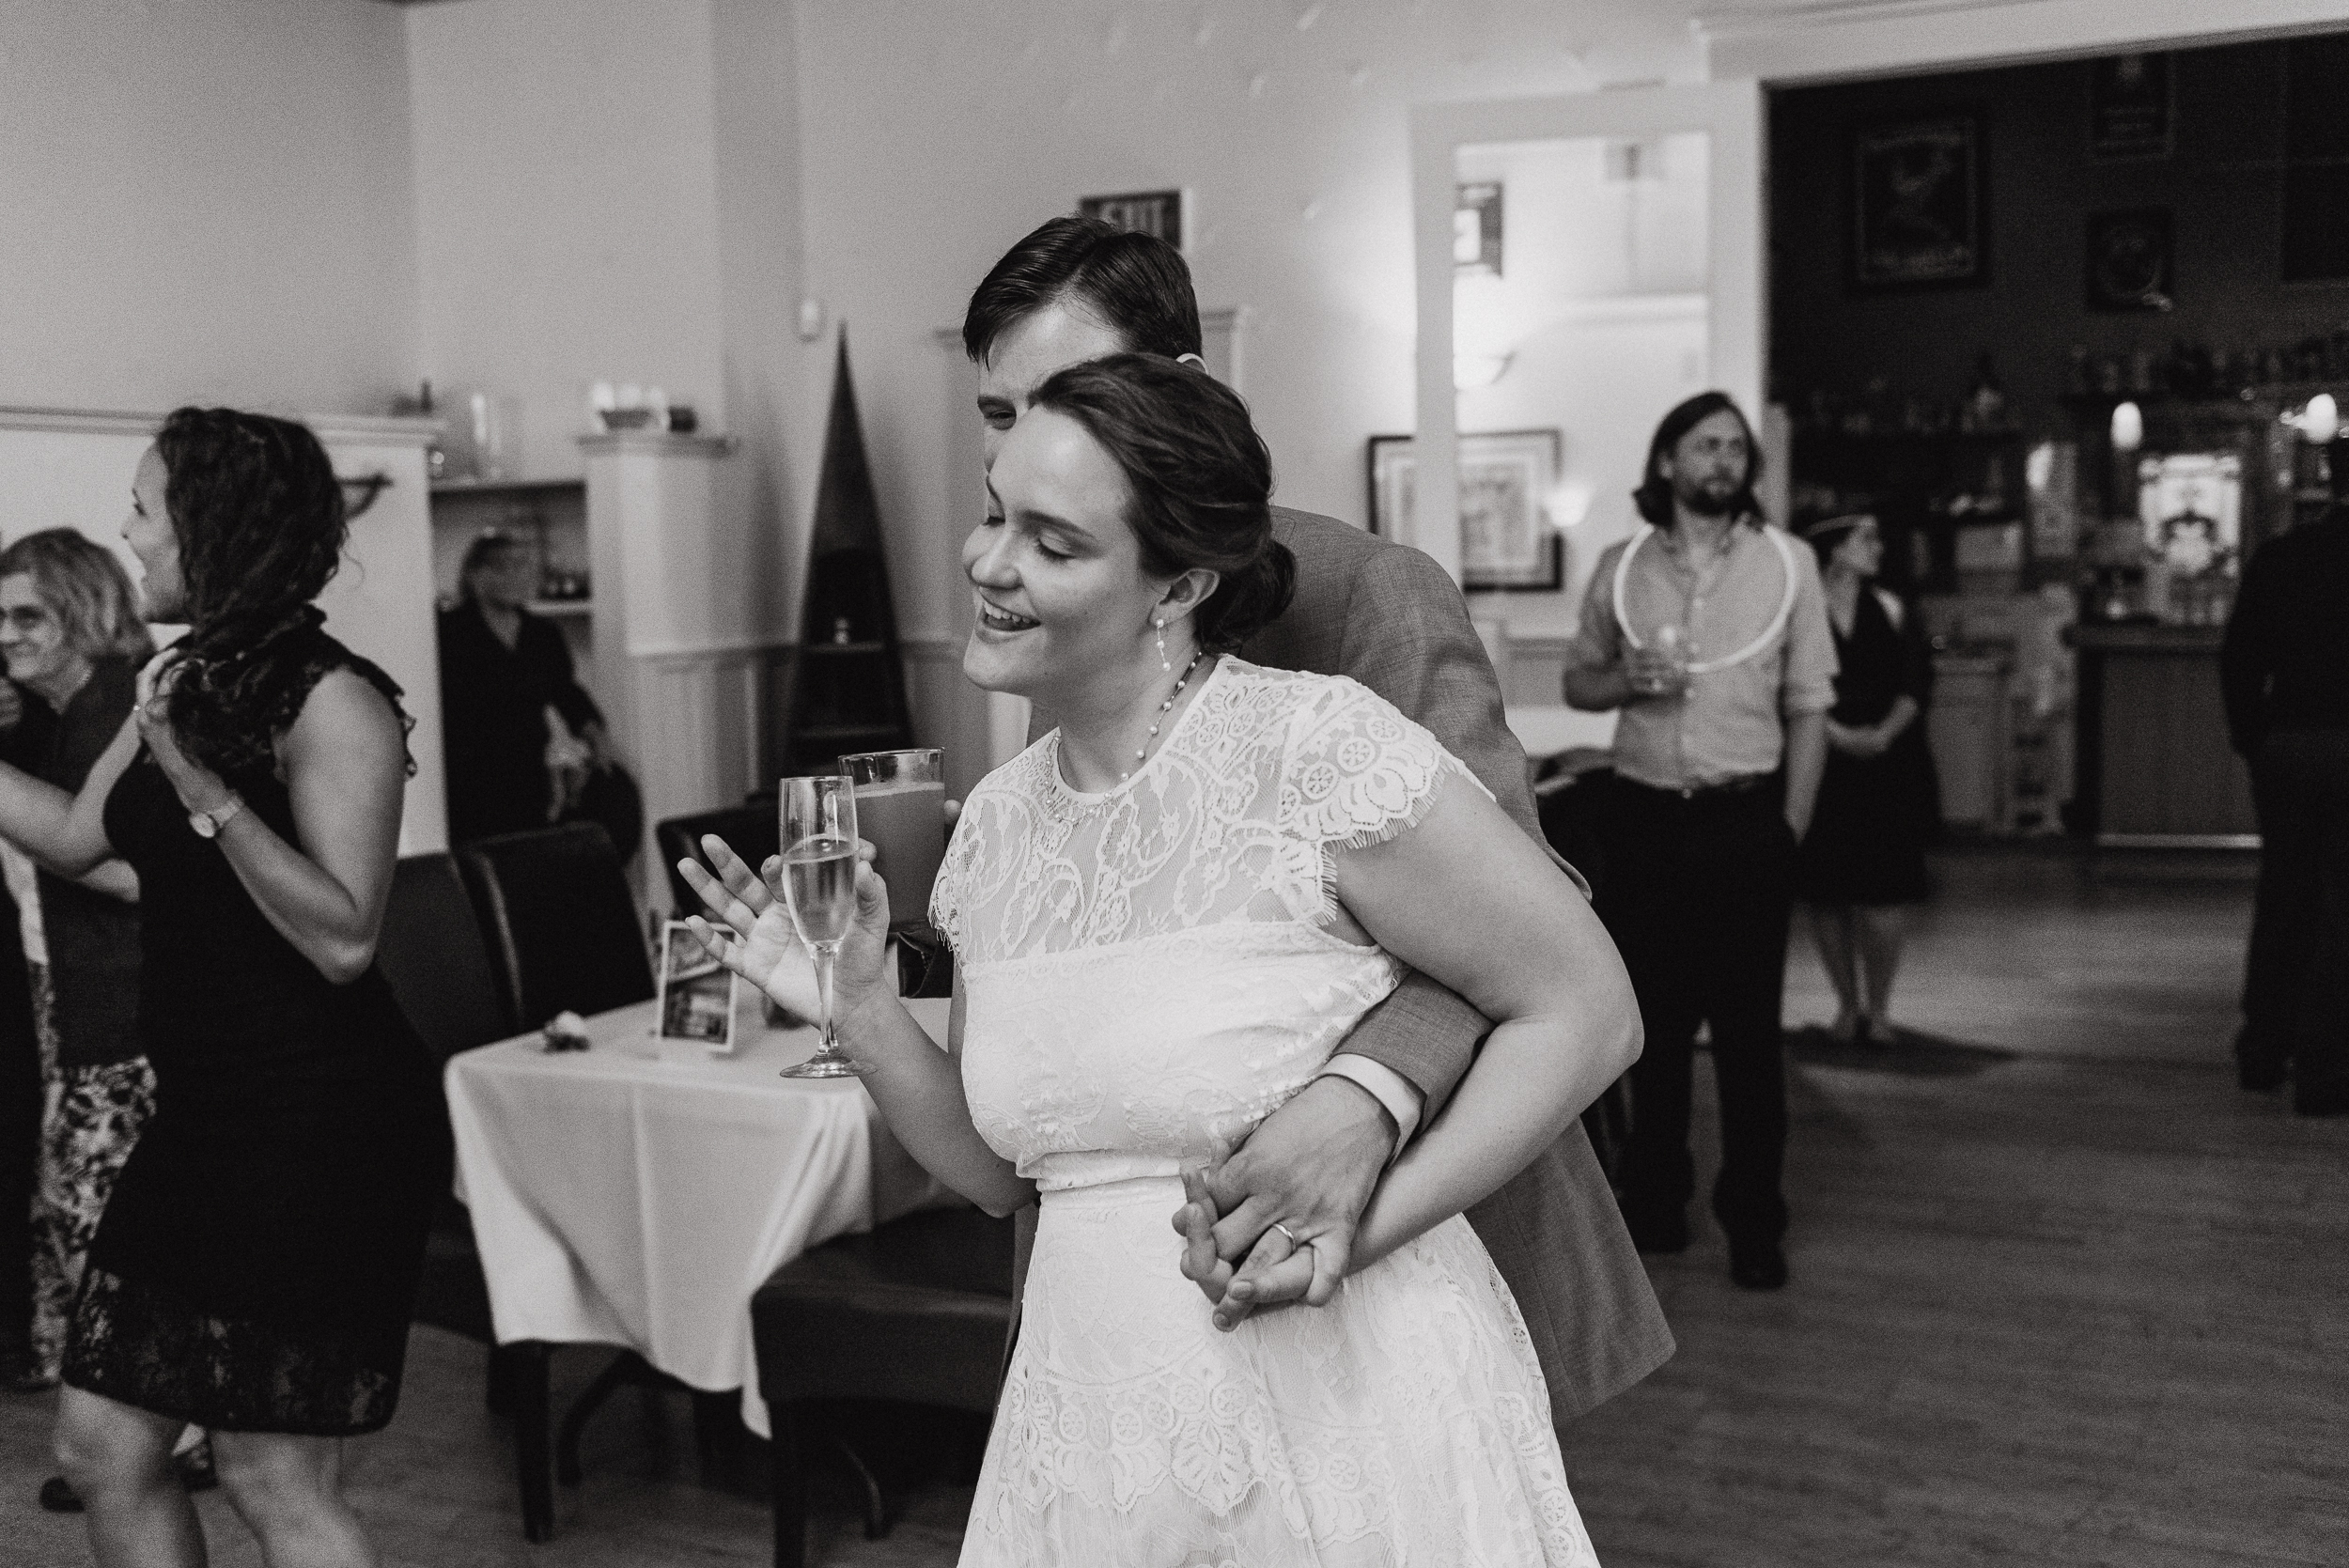 110-highland-dell-lodge-russian-river-wedding-vivianchen-652.jpg